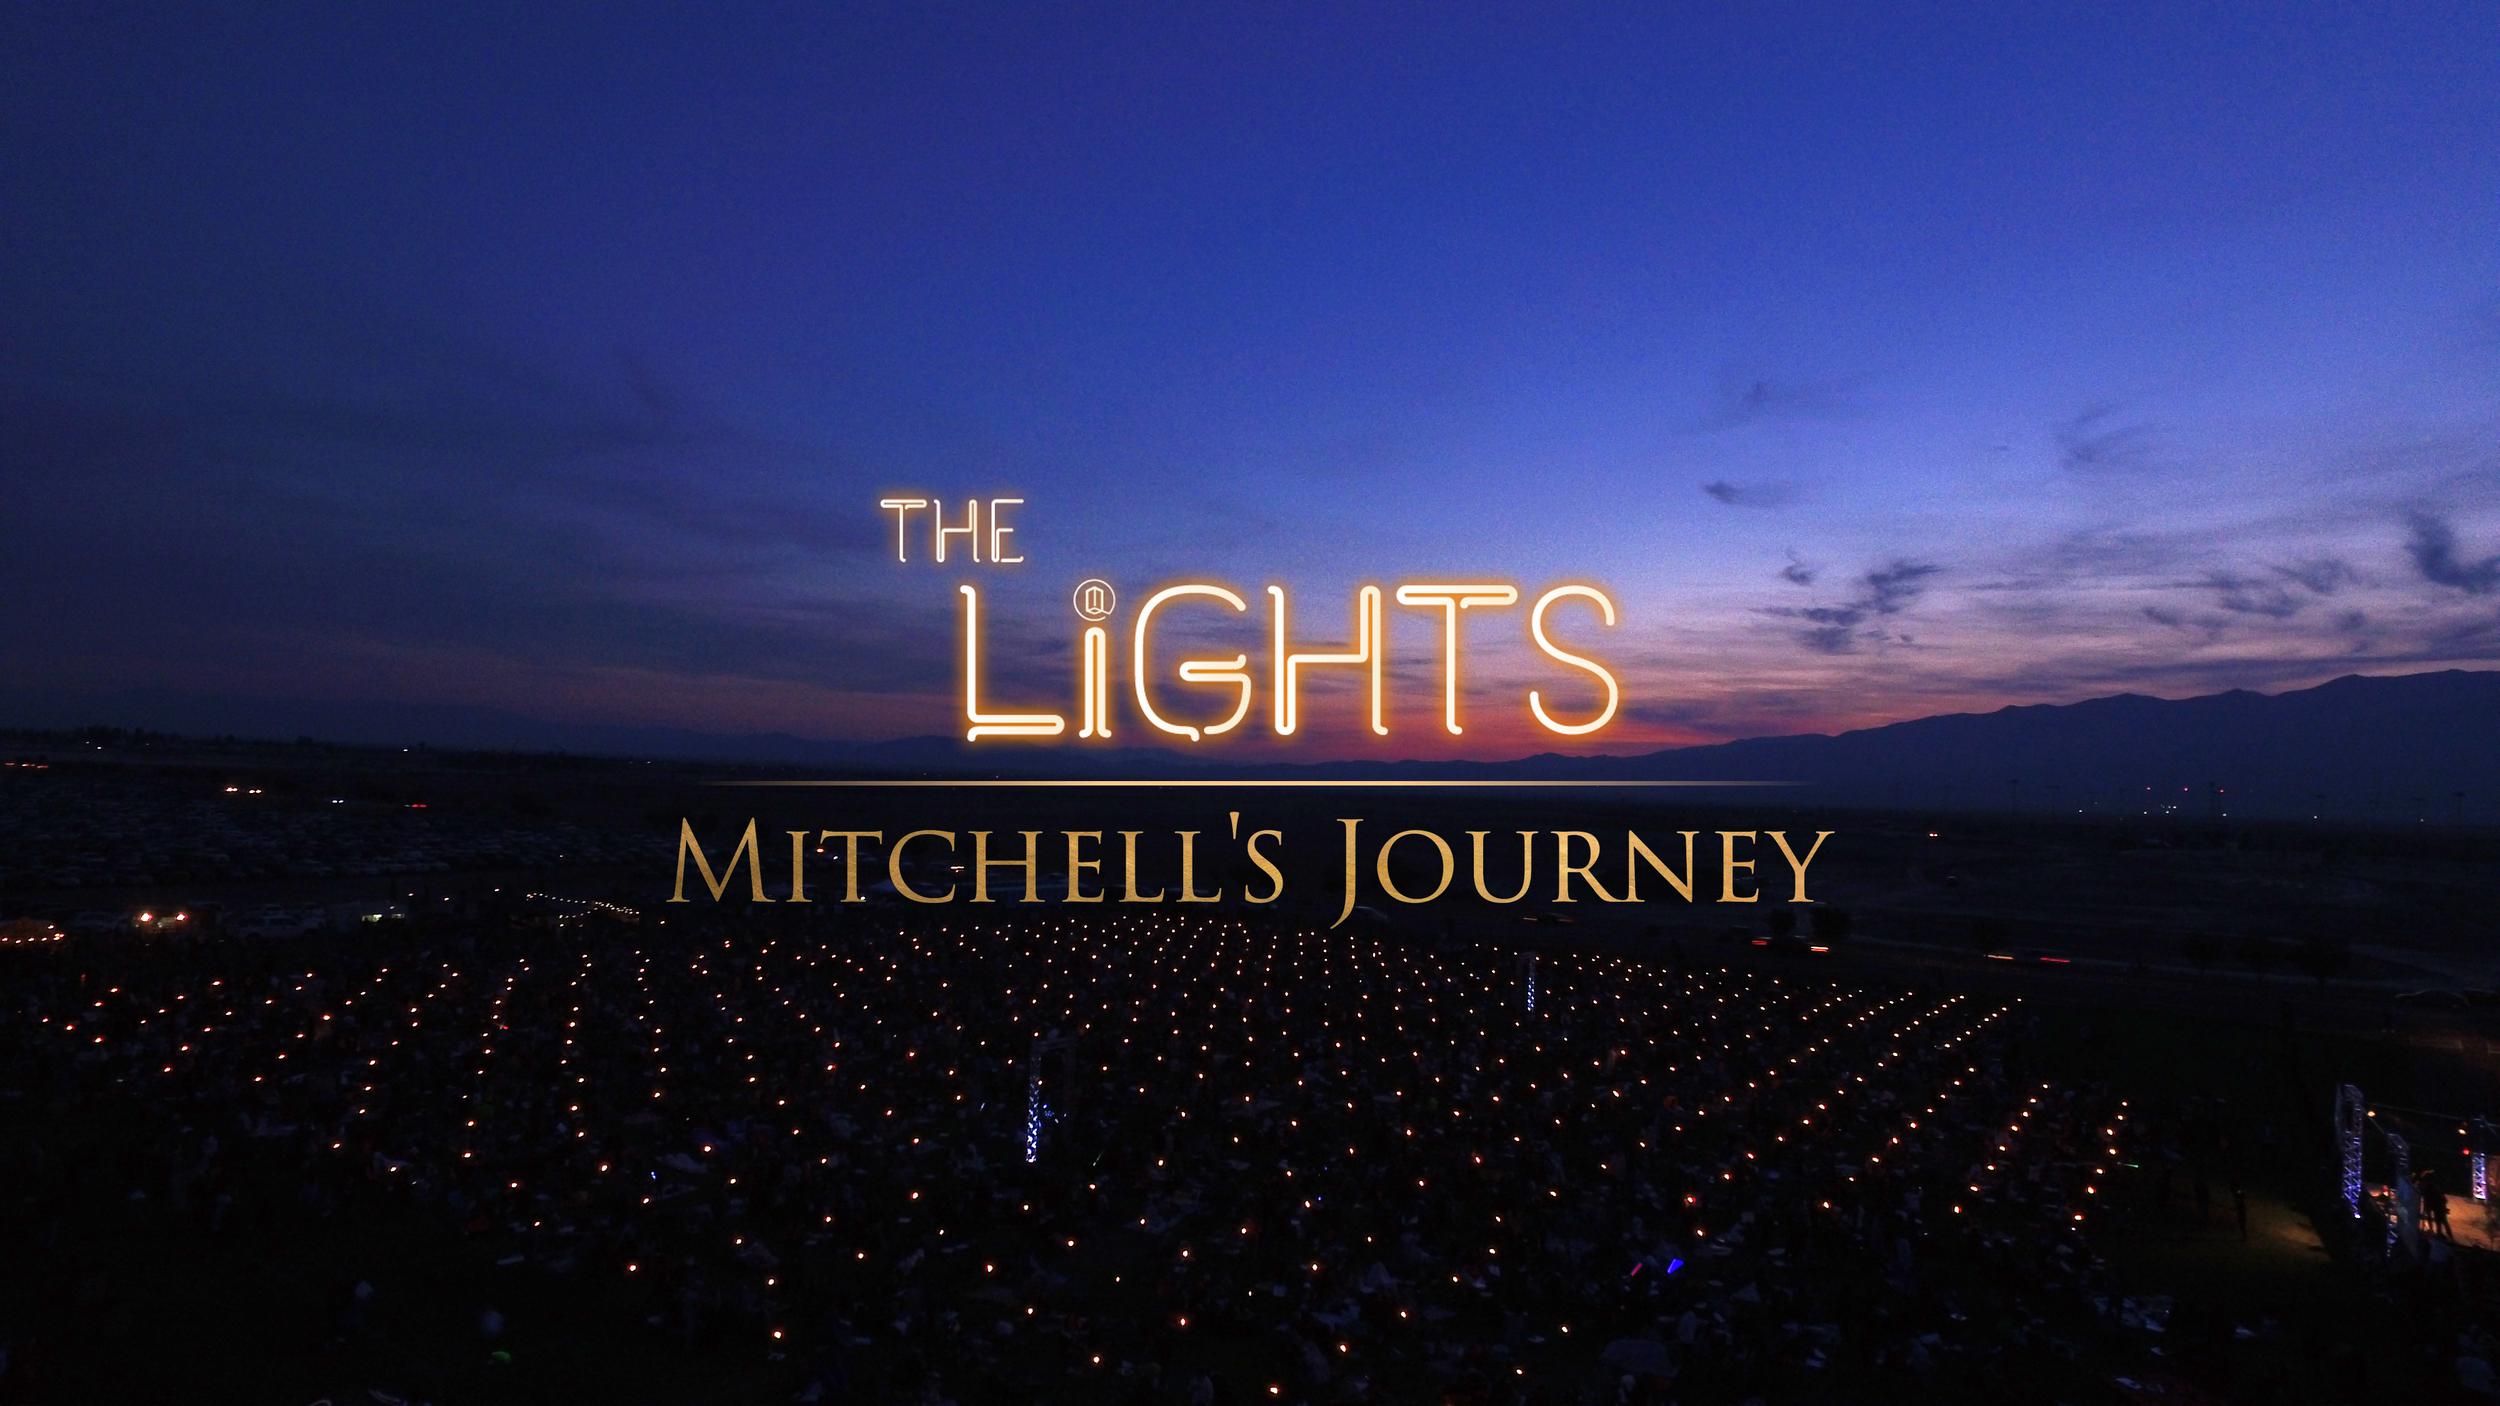 DJI_0027_Lights&Mitchell'sJourney.png